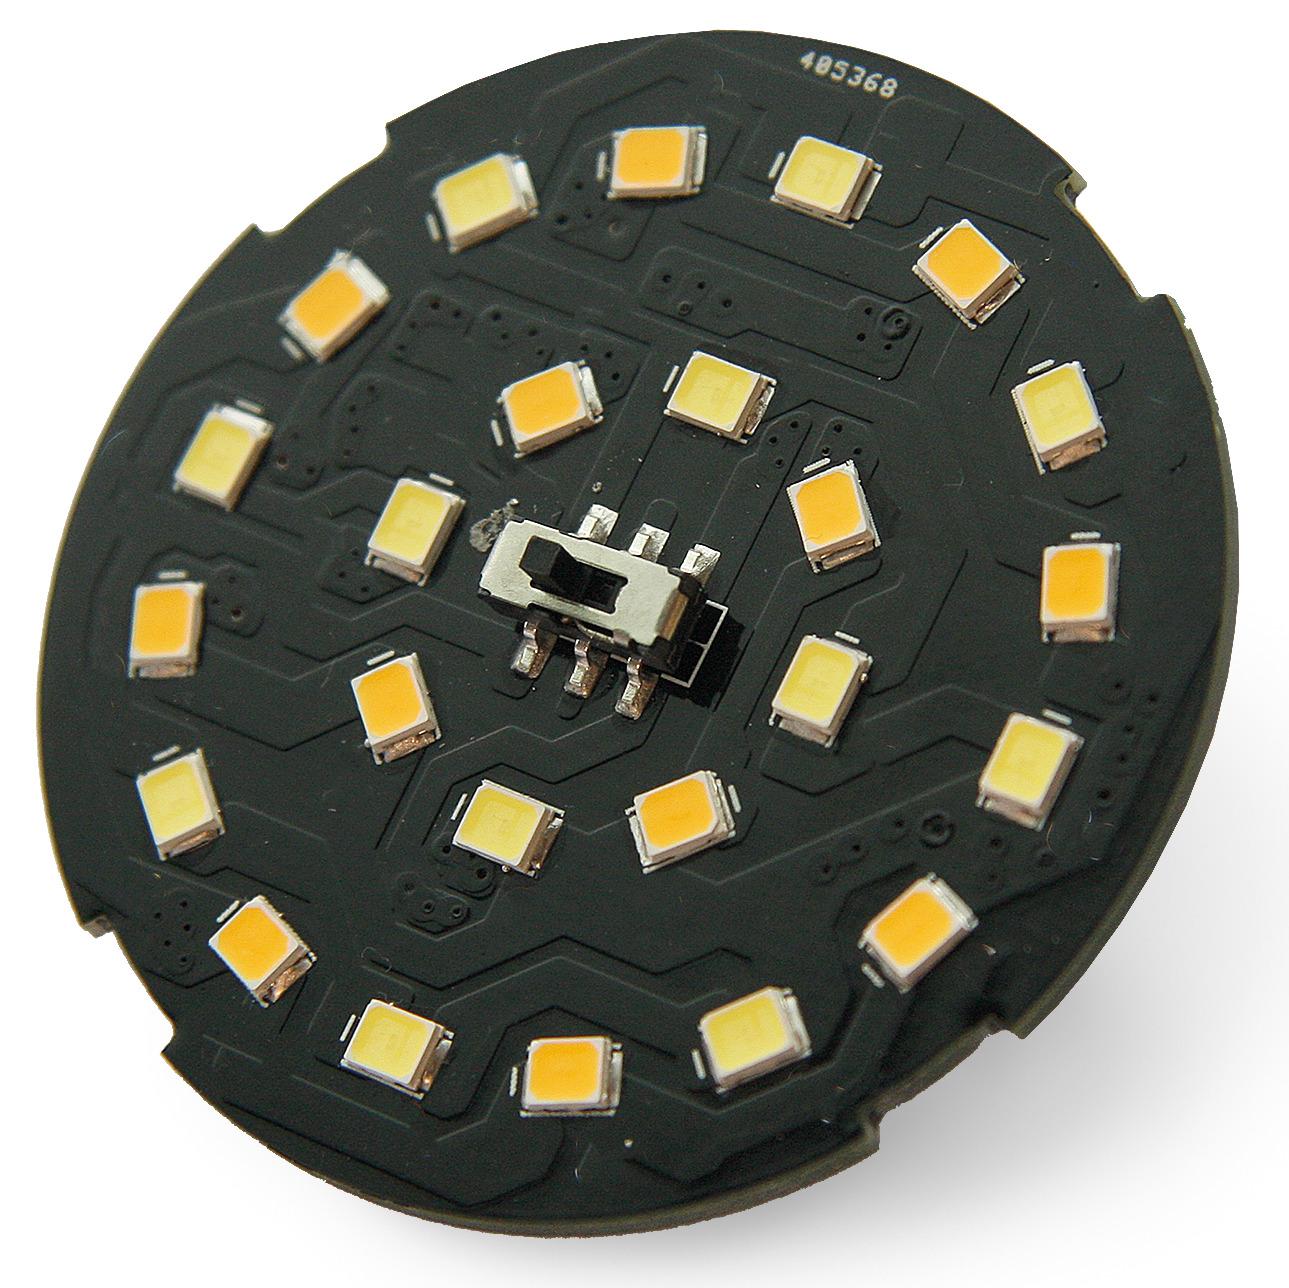 Garden Lights Fitting LED Unit 12 x Wit 2W GU5.3 - 3000K + 6000K